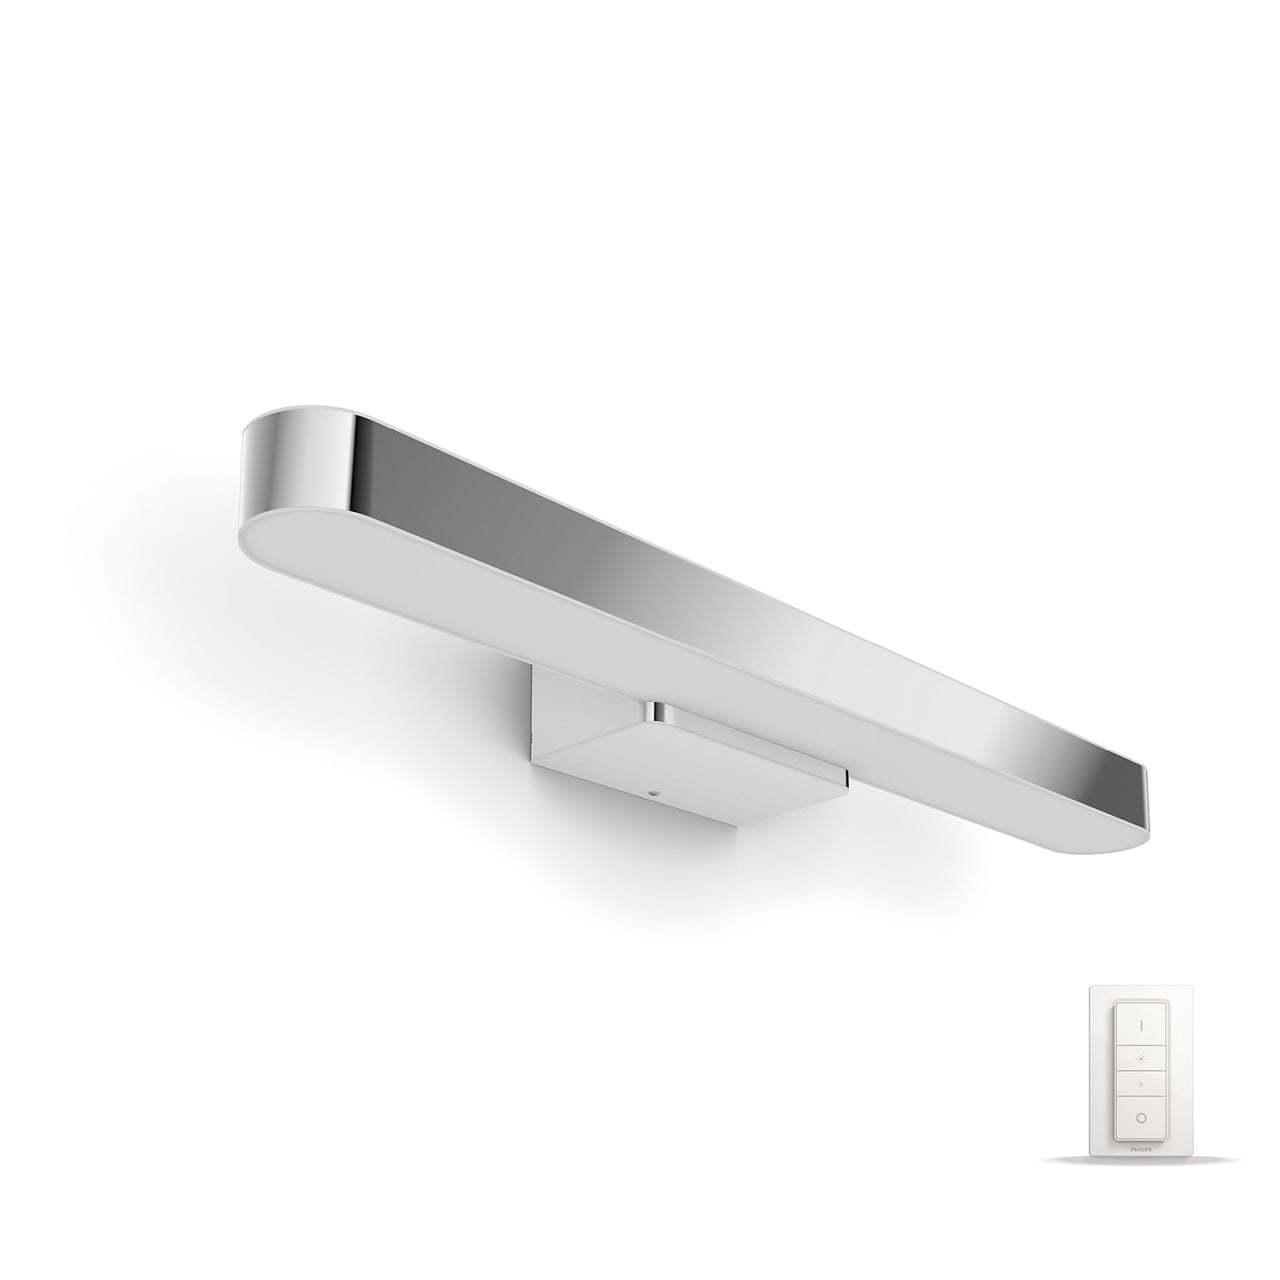 Philips Hue Bathroom Adore Mirror Light image